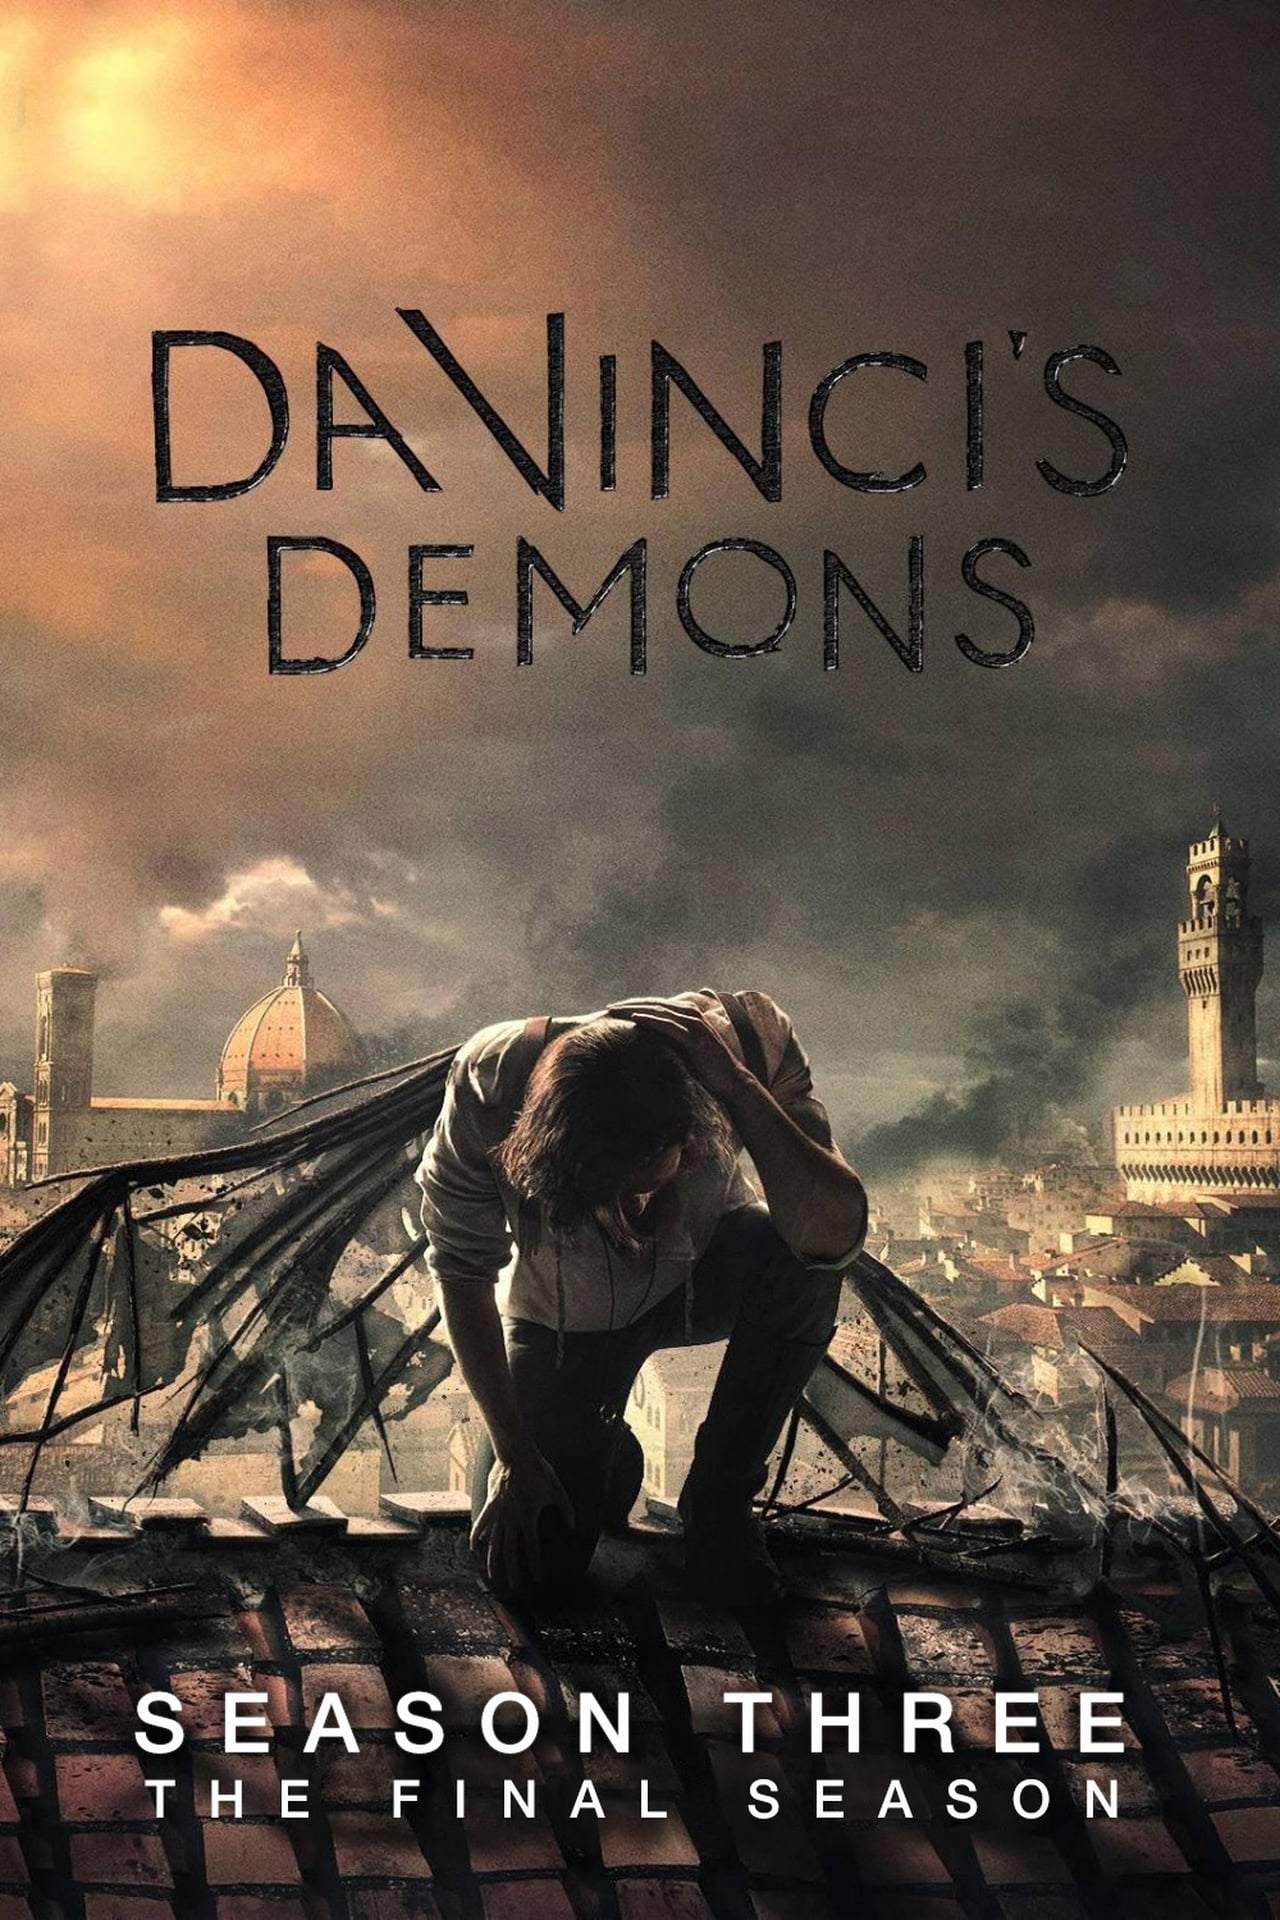 Da Vinci's Demons (2015)